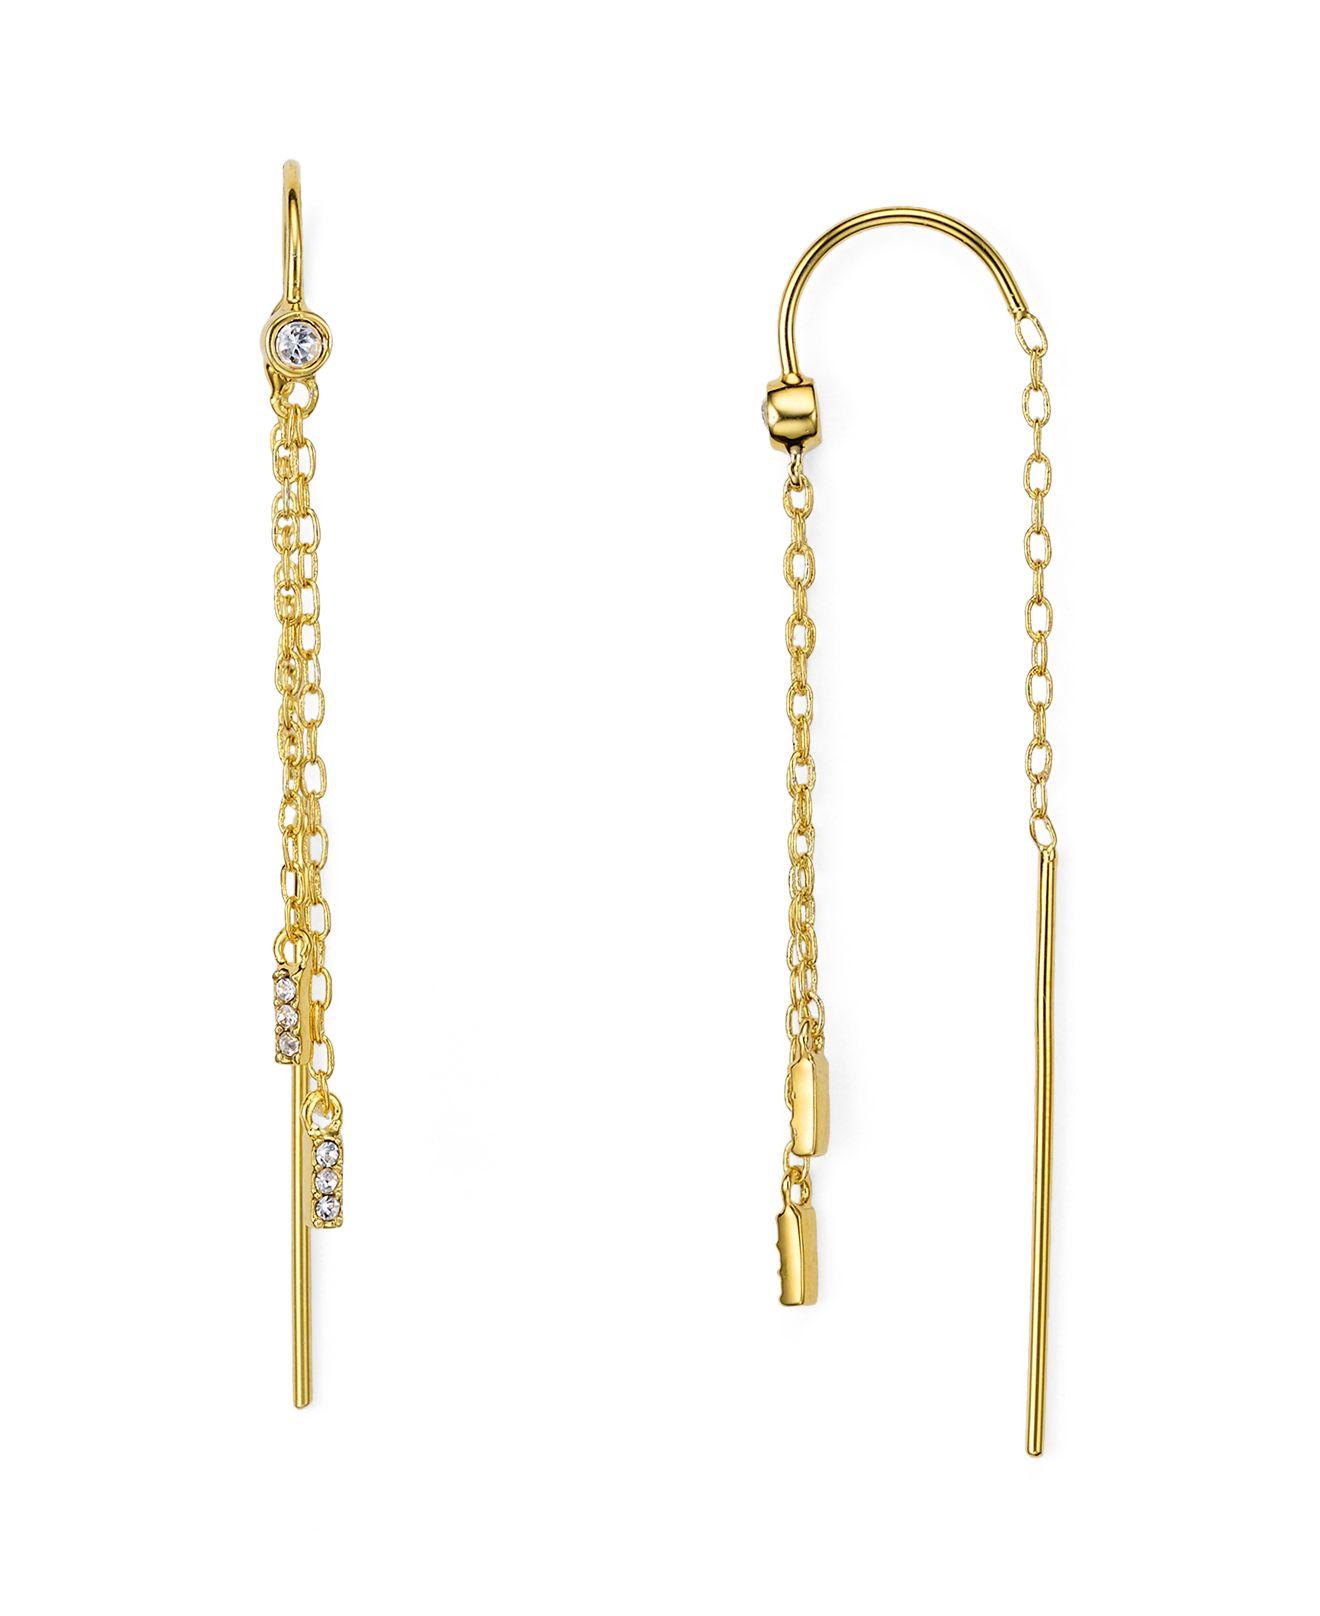 Baublebar Magic Threader Earrings in Gold